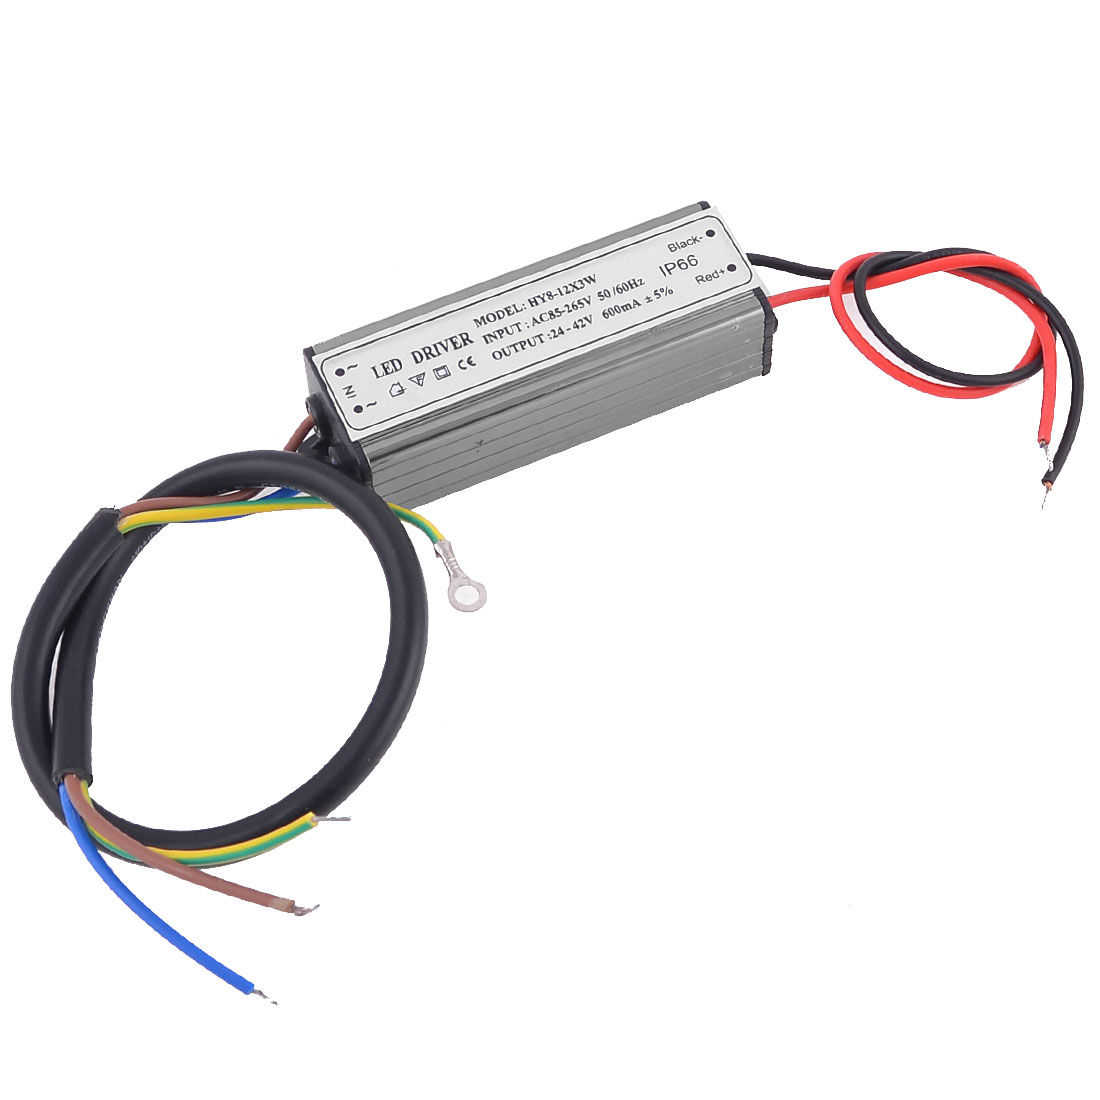 AC85-265V DC 25-40V 600mA 8-12x3W LED Driver Power Supply Converter